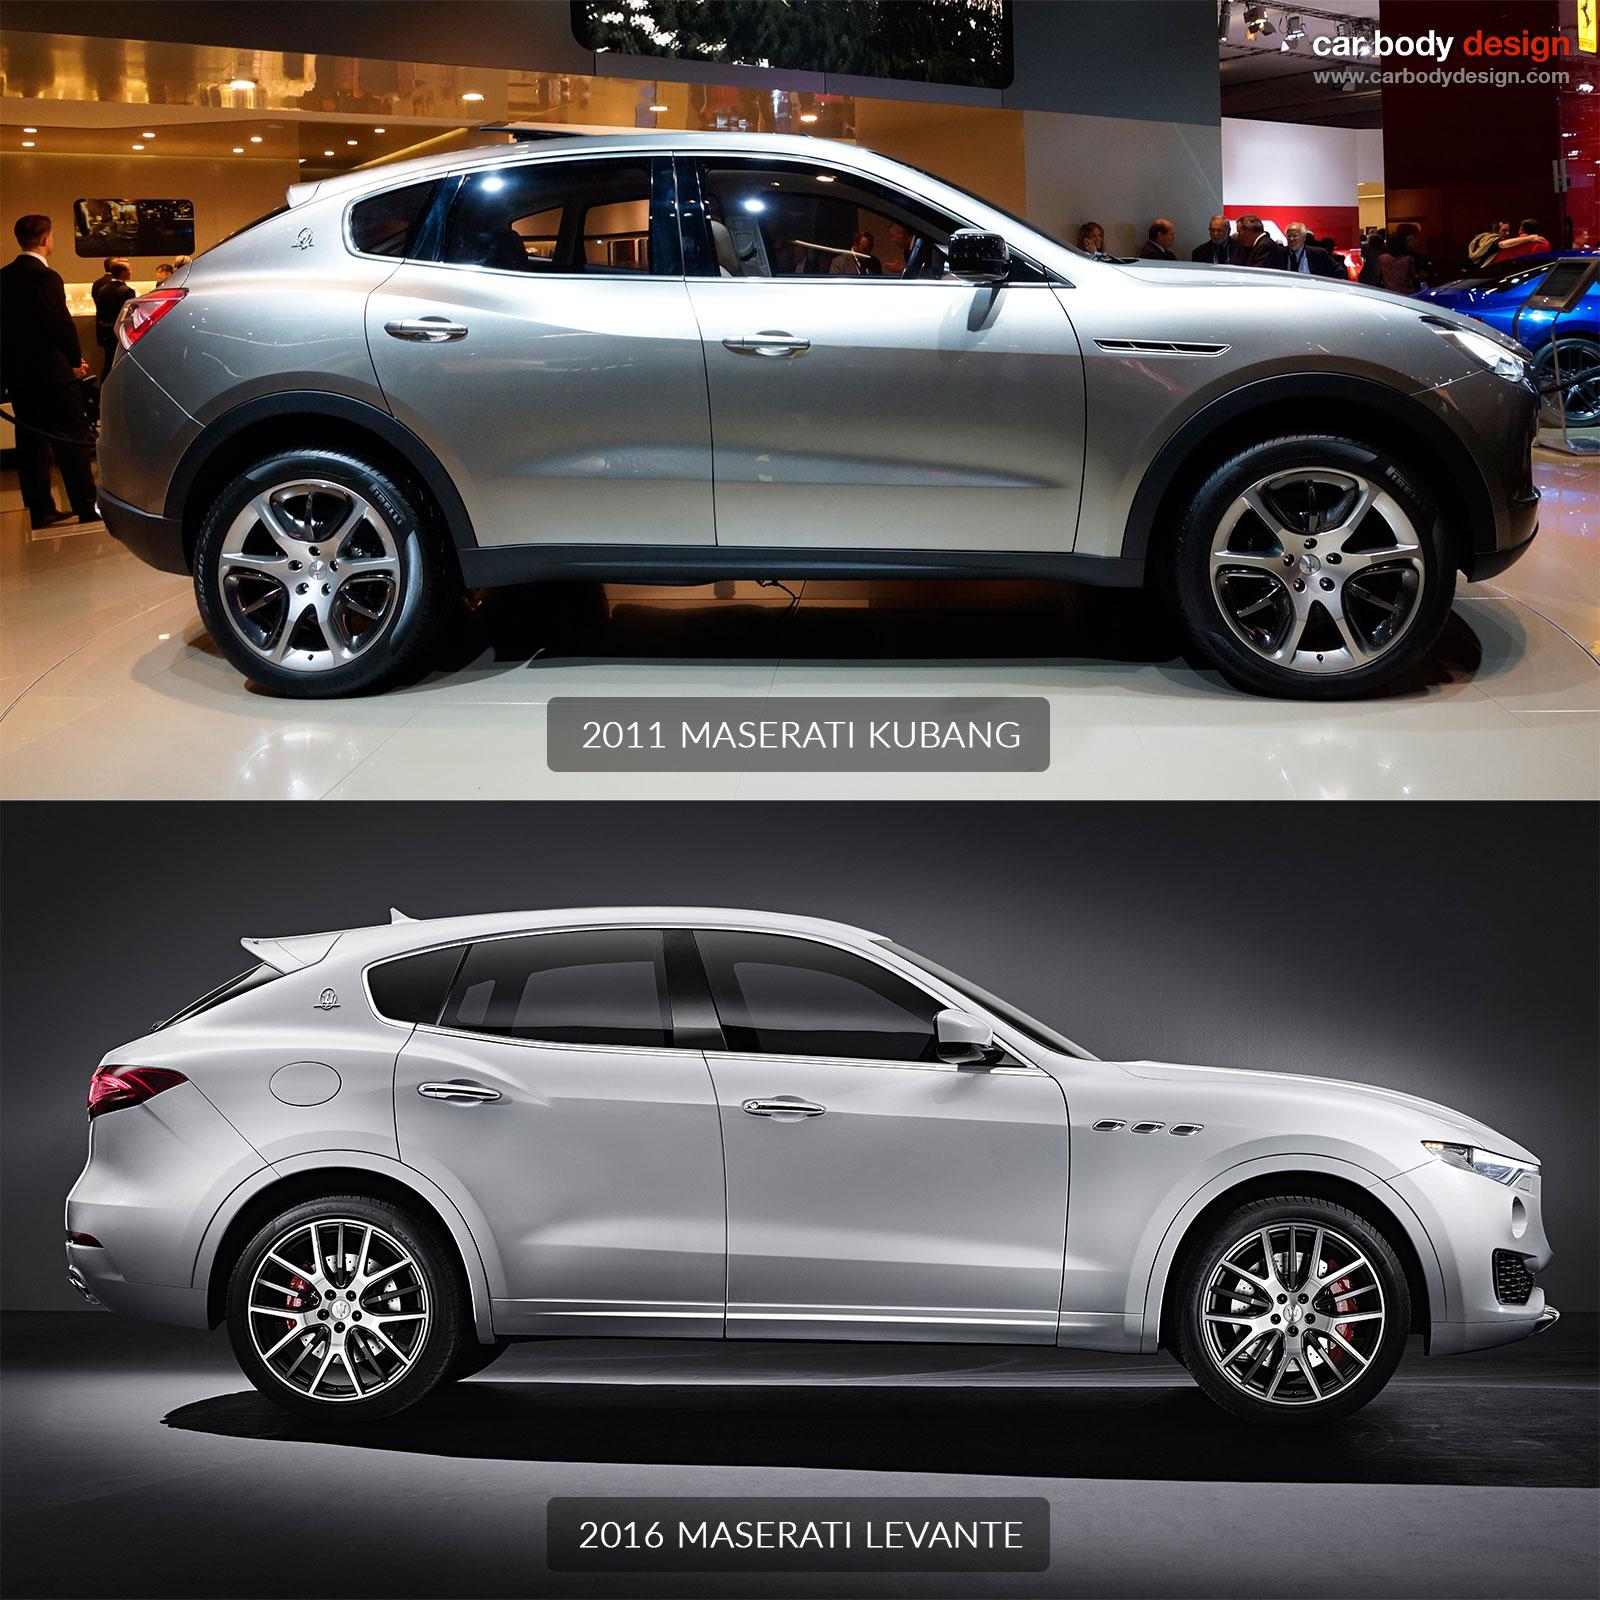 http://www.carbodydesign.com/media/2016/02/Maserati-Levante-vs-Maserati-Kubang-Design-Comparison-01.jpg